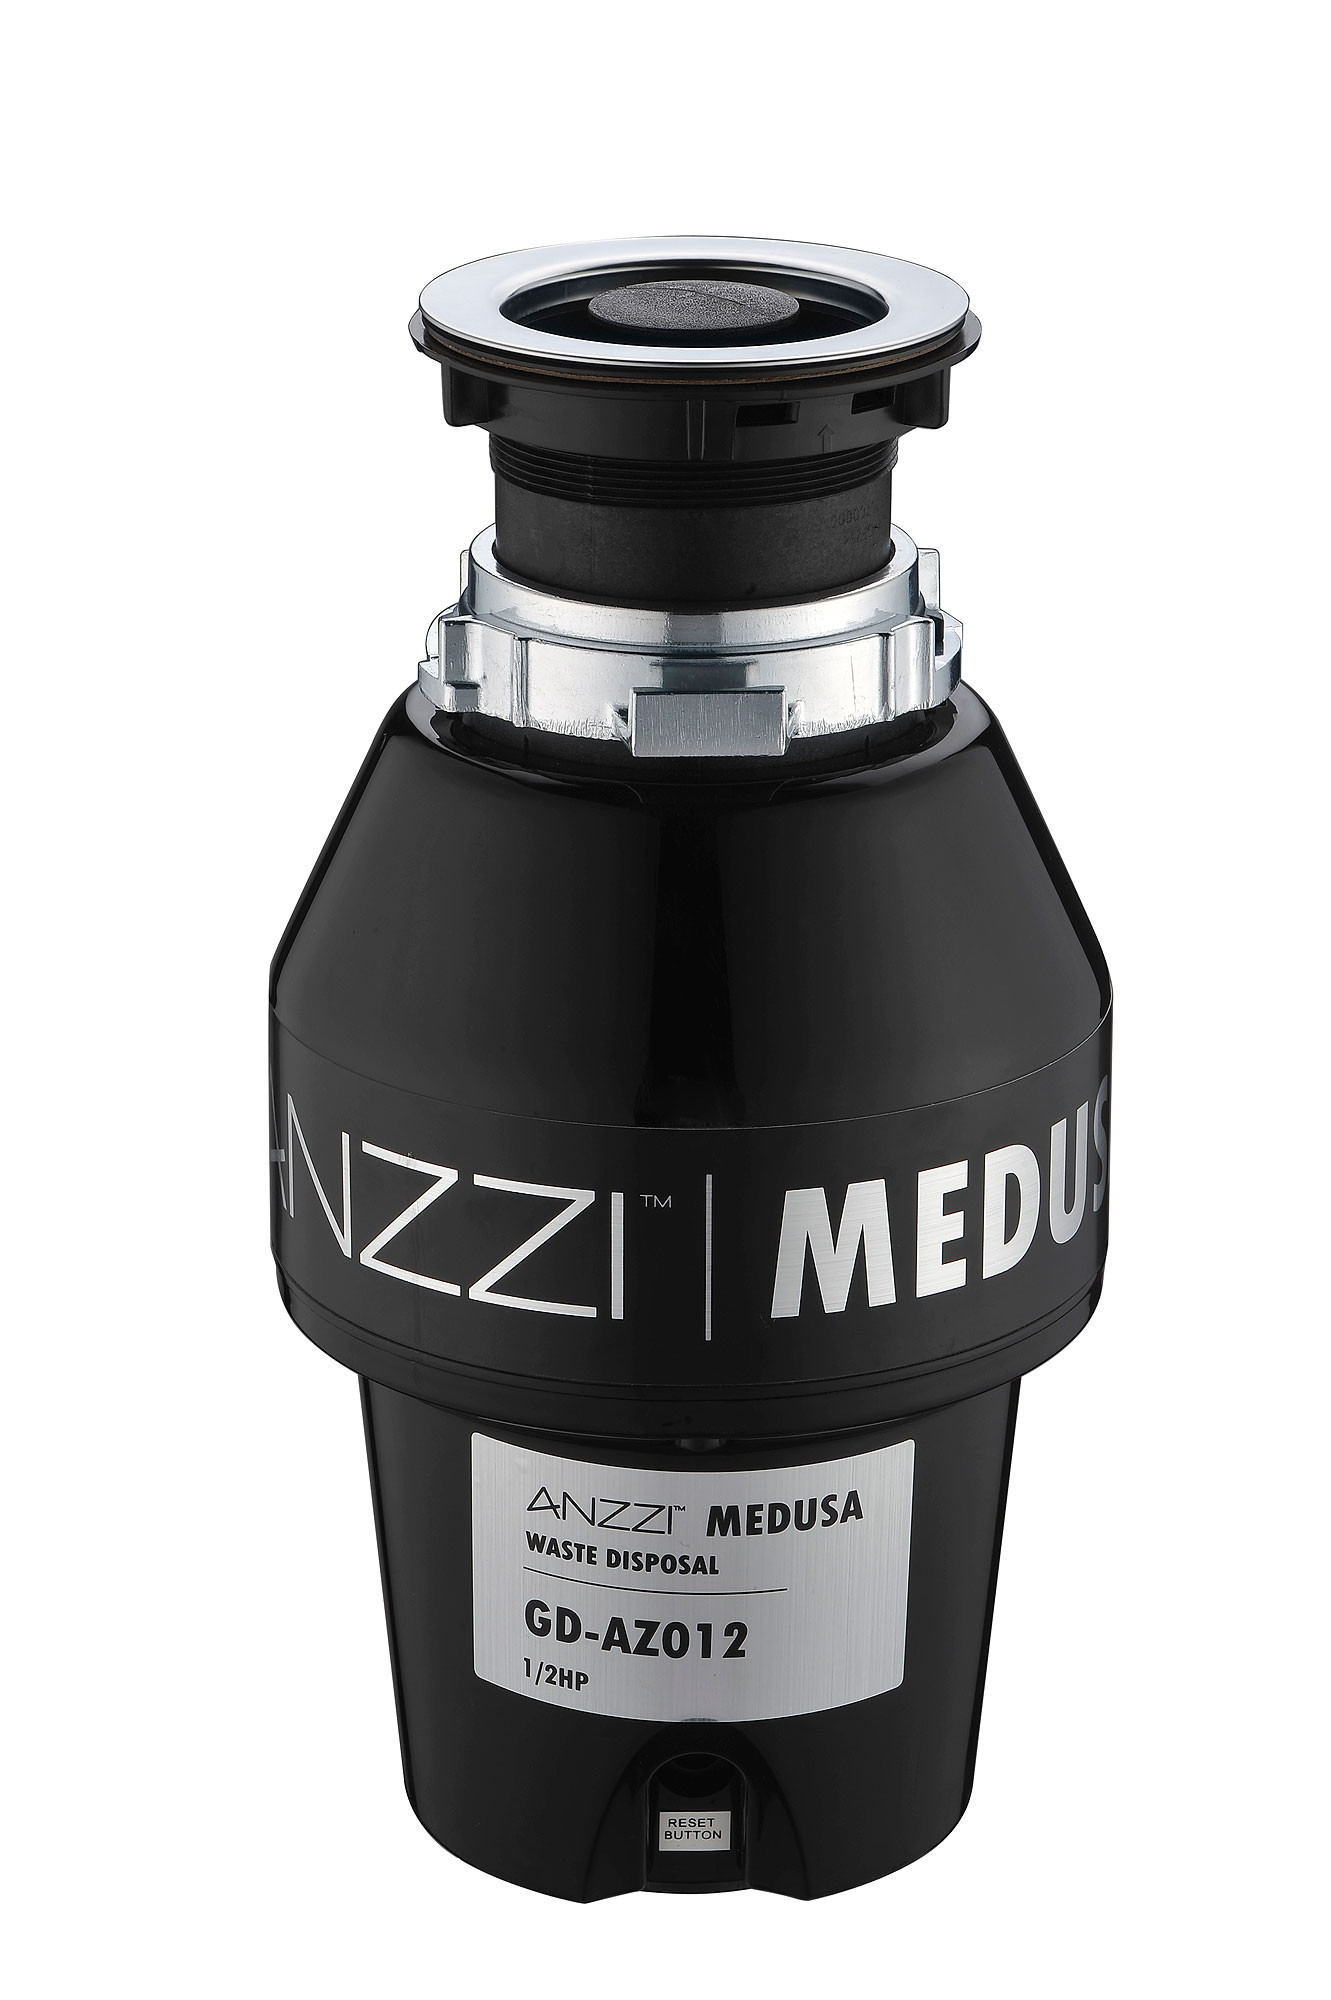 ANZZI GD-AZ012 Black MEDUSA Series 1/2 HP Continuous Feed Garbage Disposal